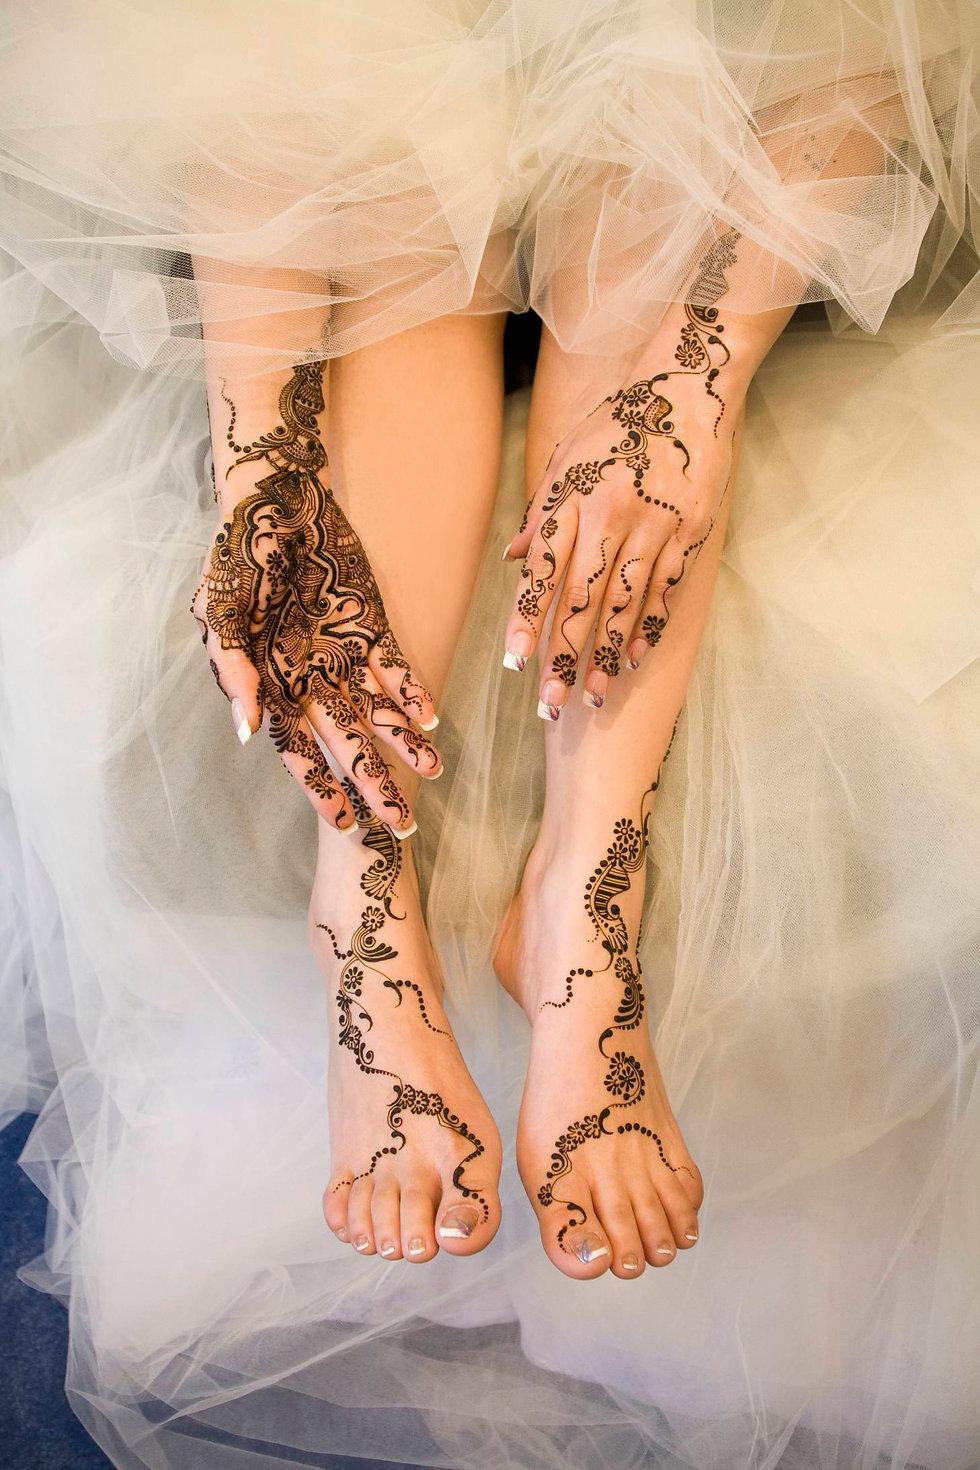 Henna course, mehndi course, henna training, learn henna, learn henna london